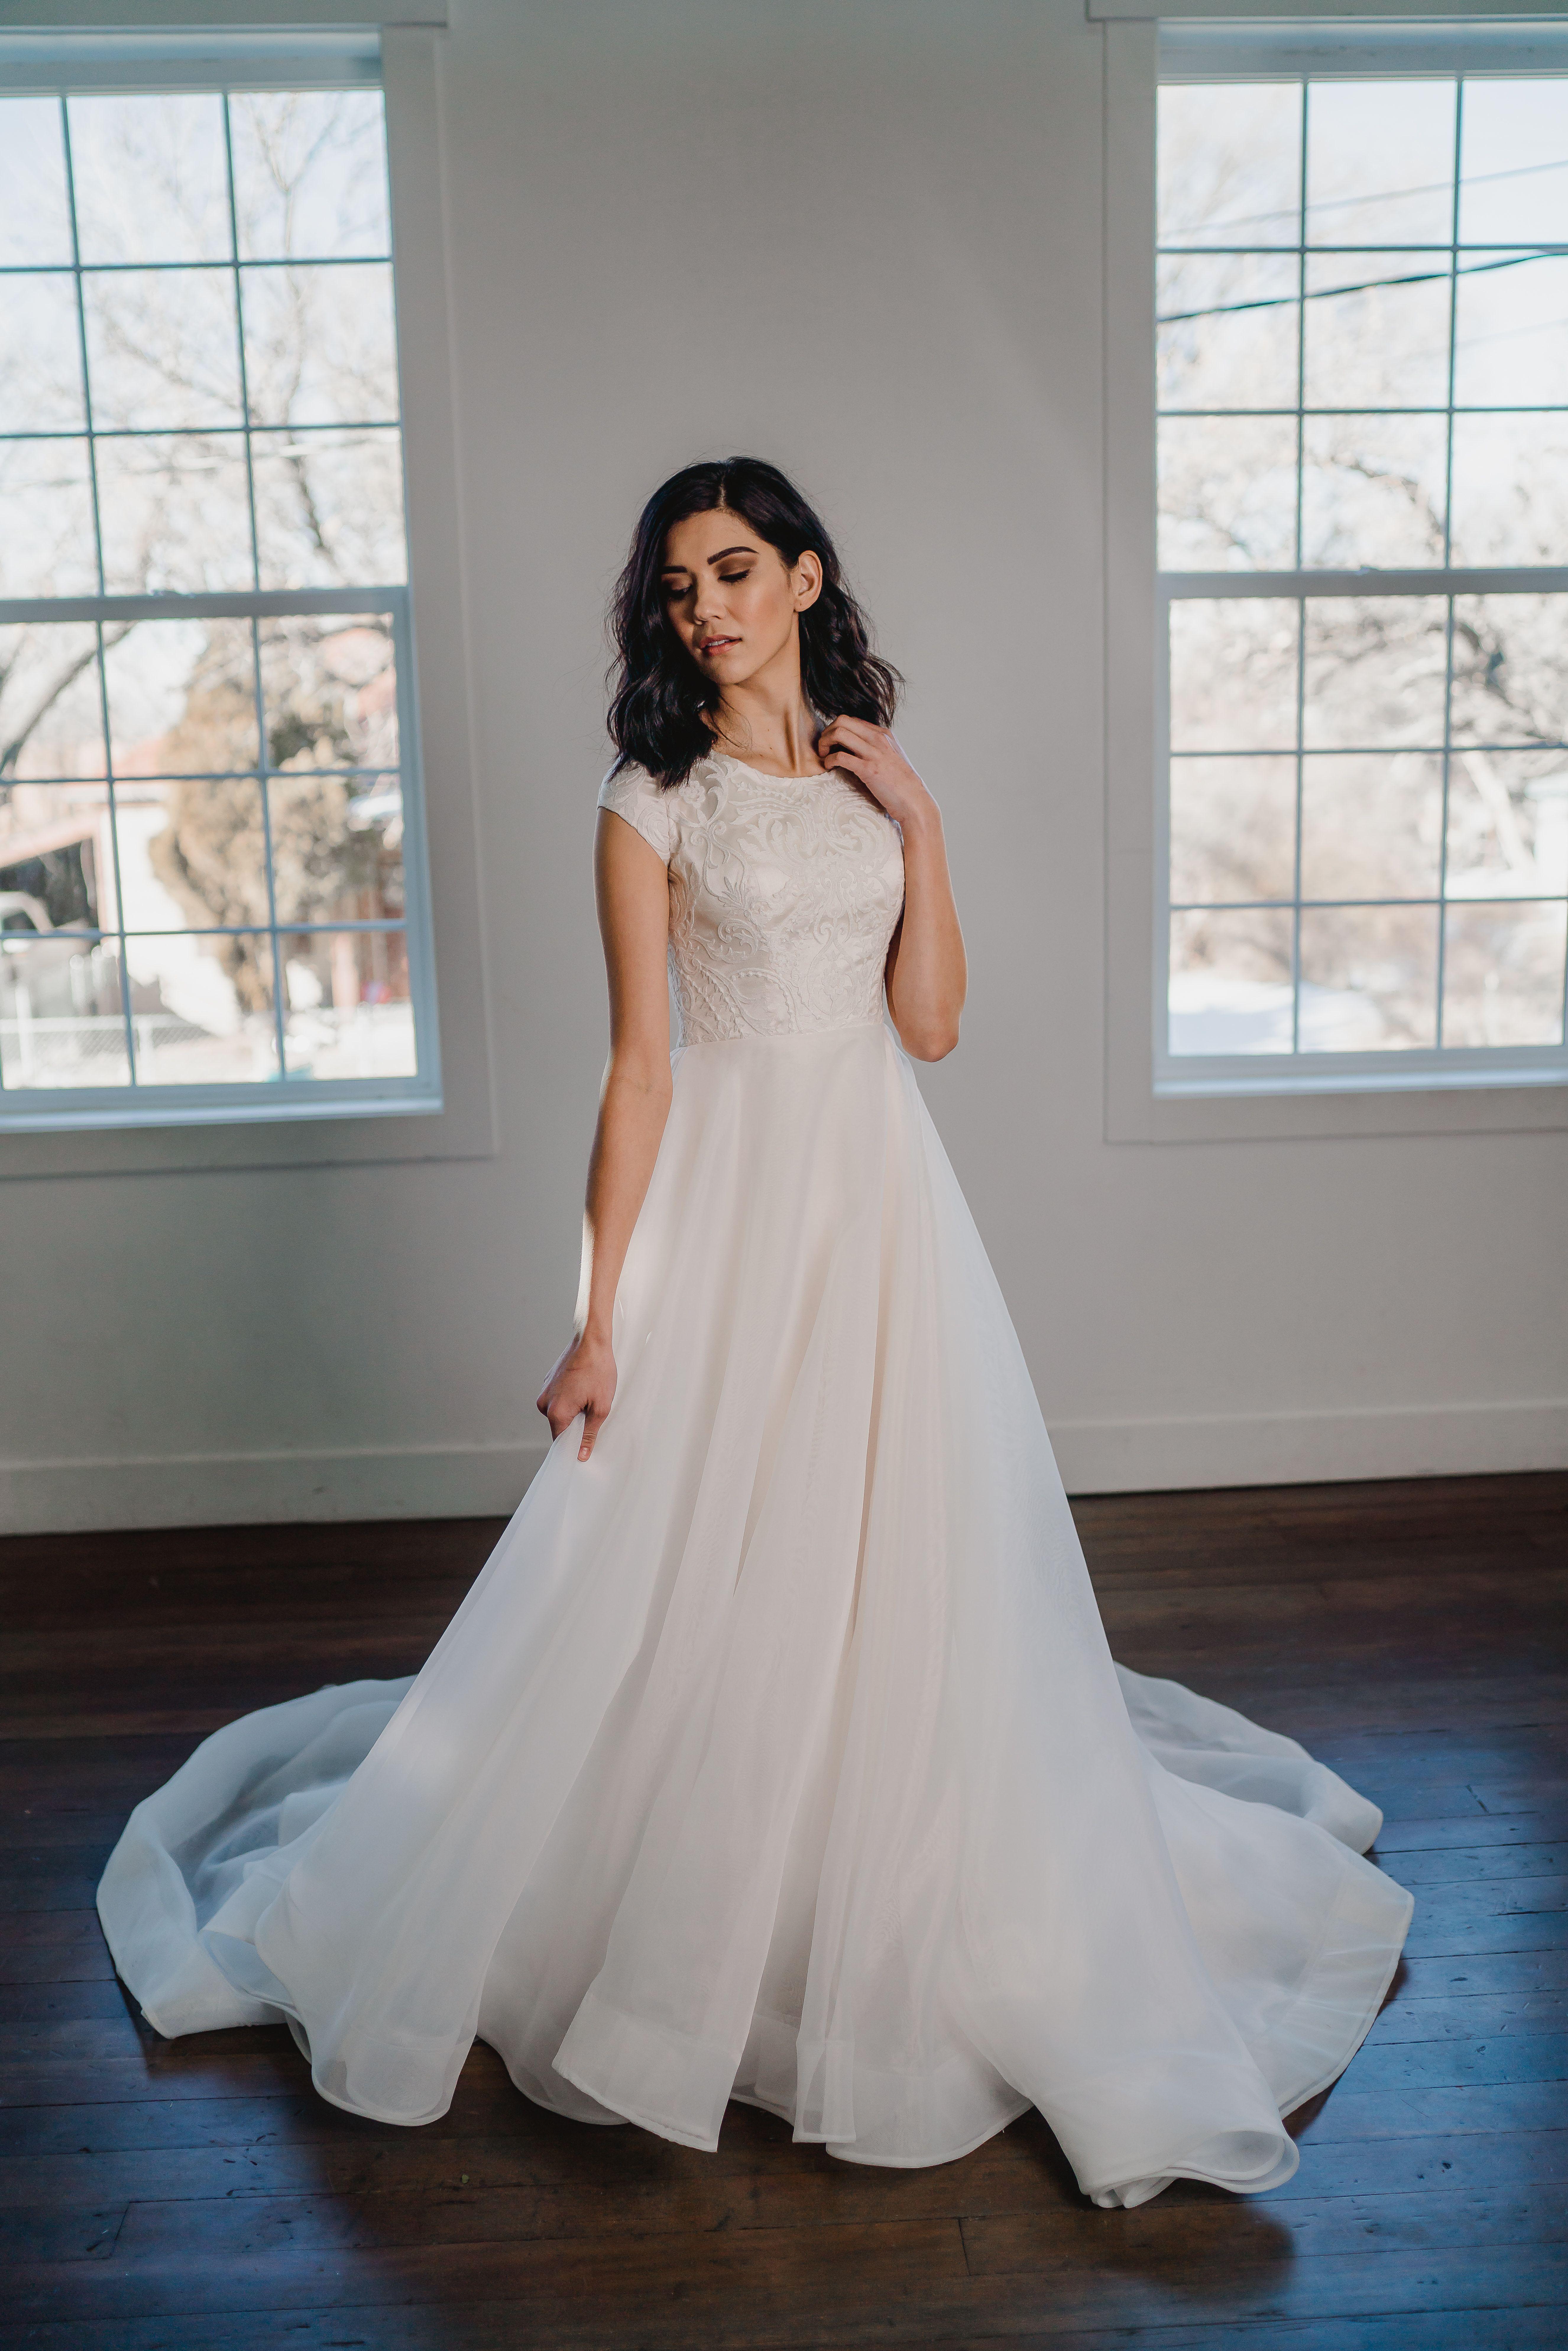 Holly Gown Natalia Chantae Photography Modest Wedding Dress